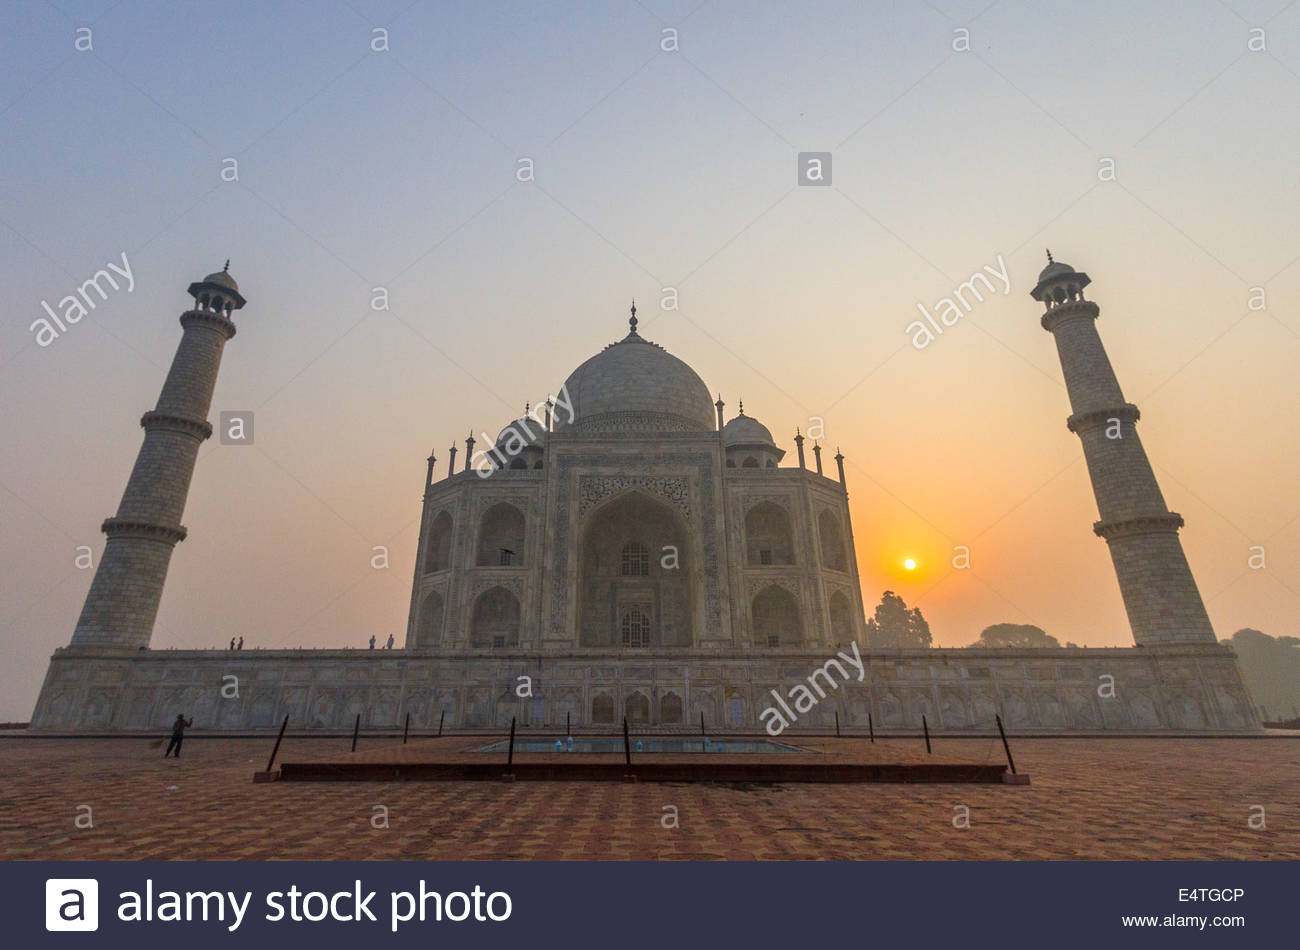 The Taj Mahal at sunrise in Agra, India - Stock Image